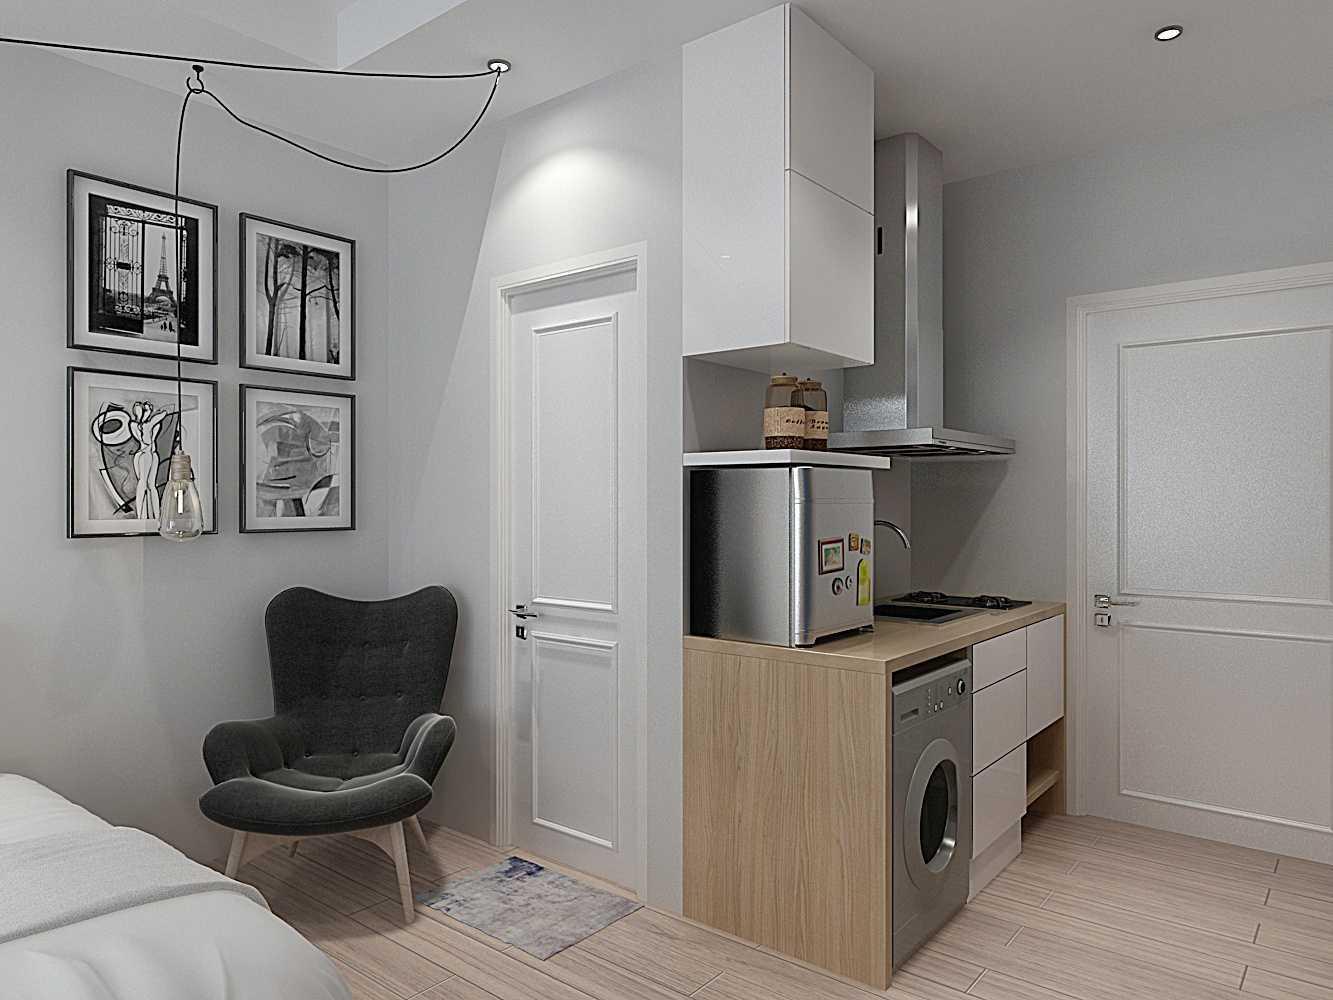 Foto inspirasi ide desain dapur skandinavia V3-3-011492687066410 oleh 7Design Architect di Arsitag